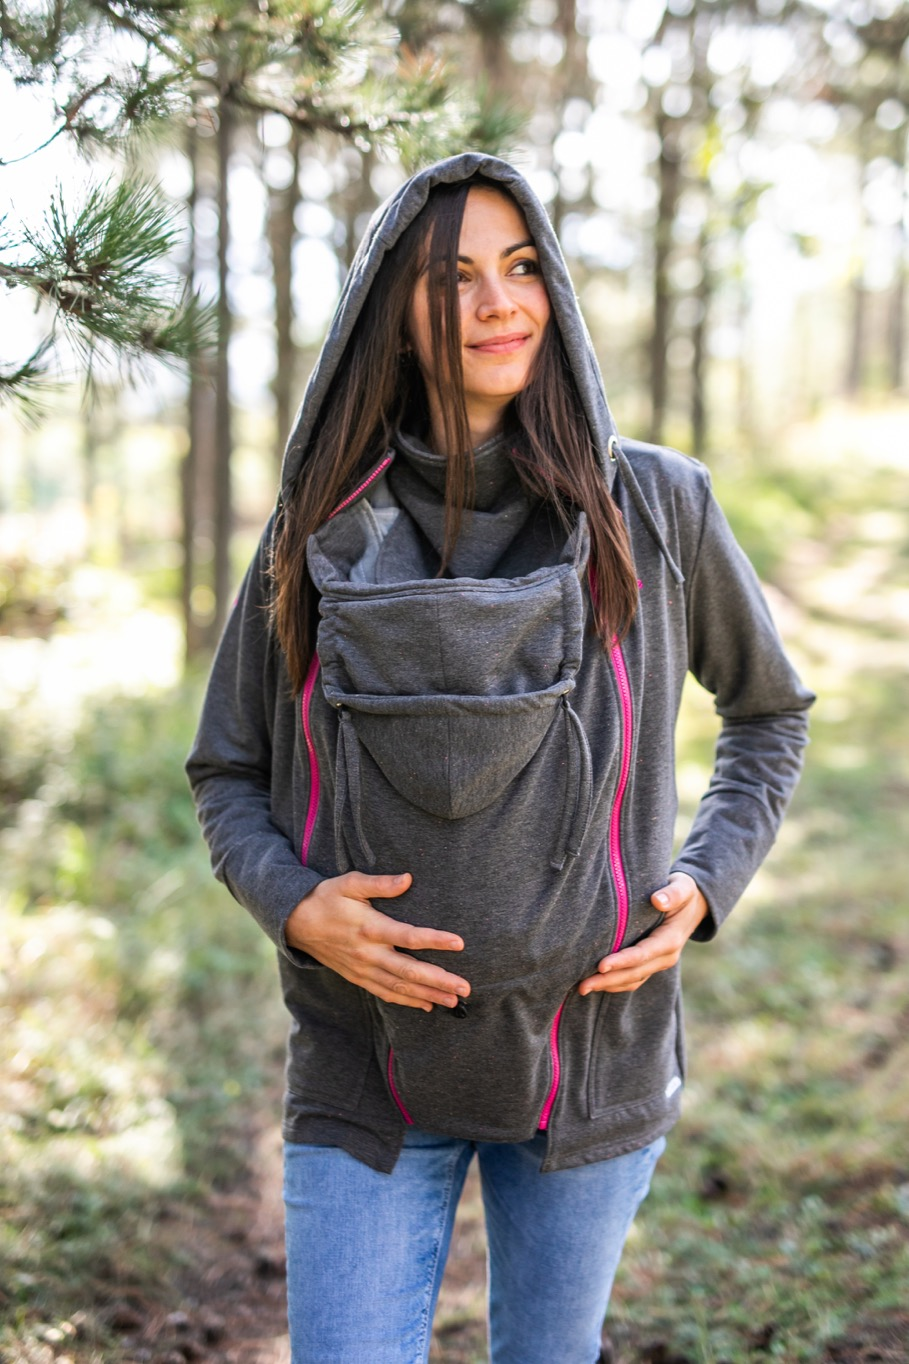 Be Lenka - Dunkel-grau Jogging Tragejacke l Tragen eines Sweatshirts mit 3 in 1 Trainingsanzug